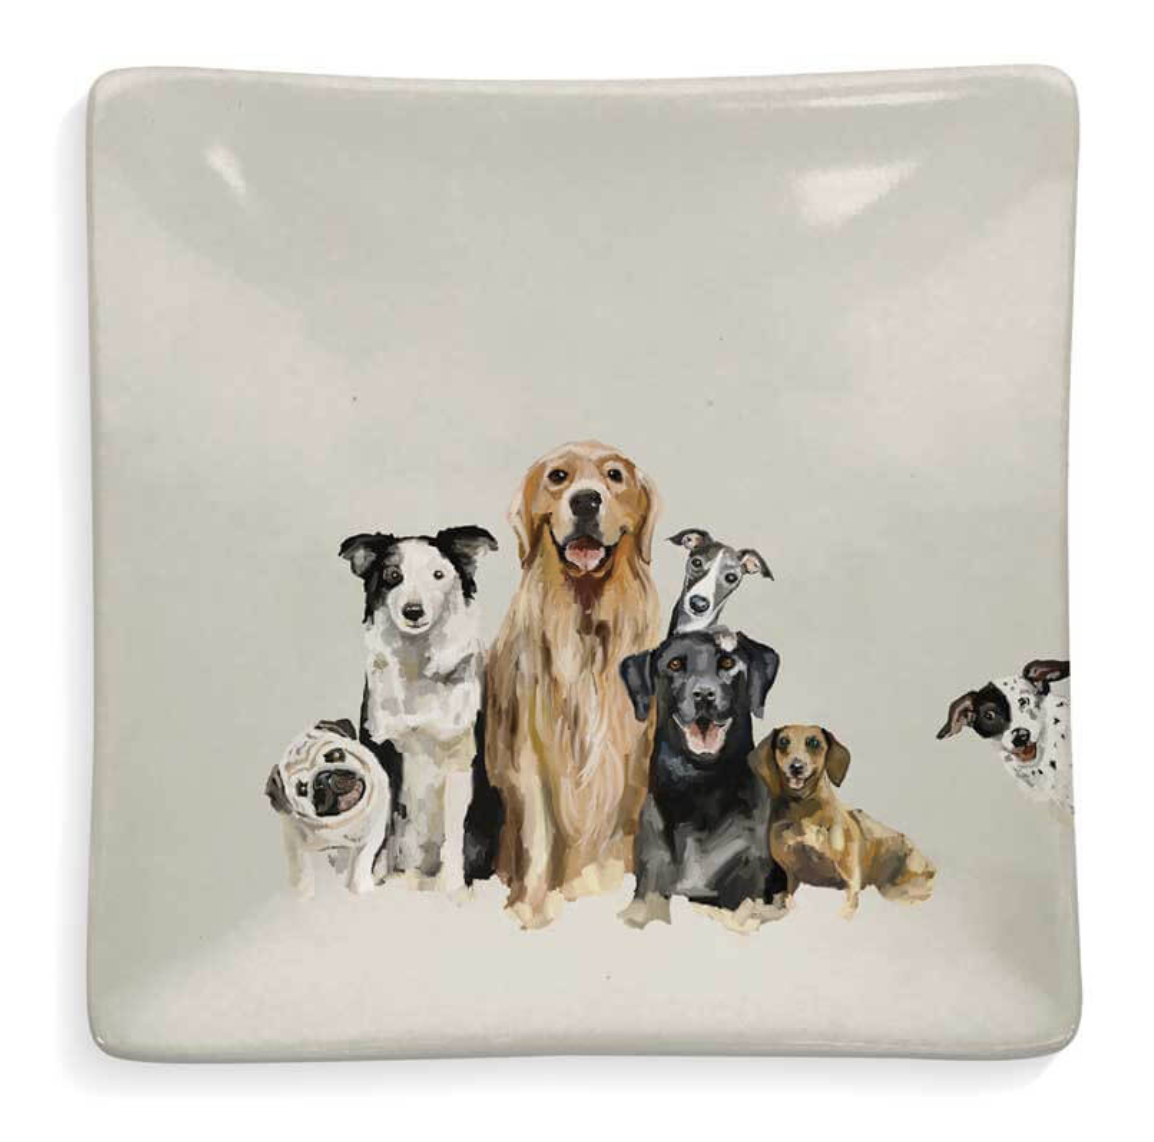 "Best Friends Decorative Dish, 4.5""x4.5"""